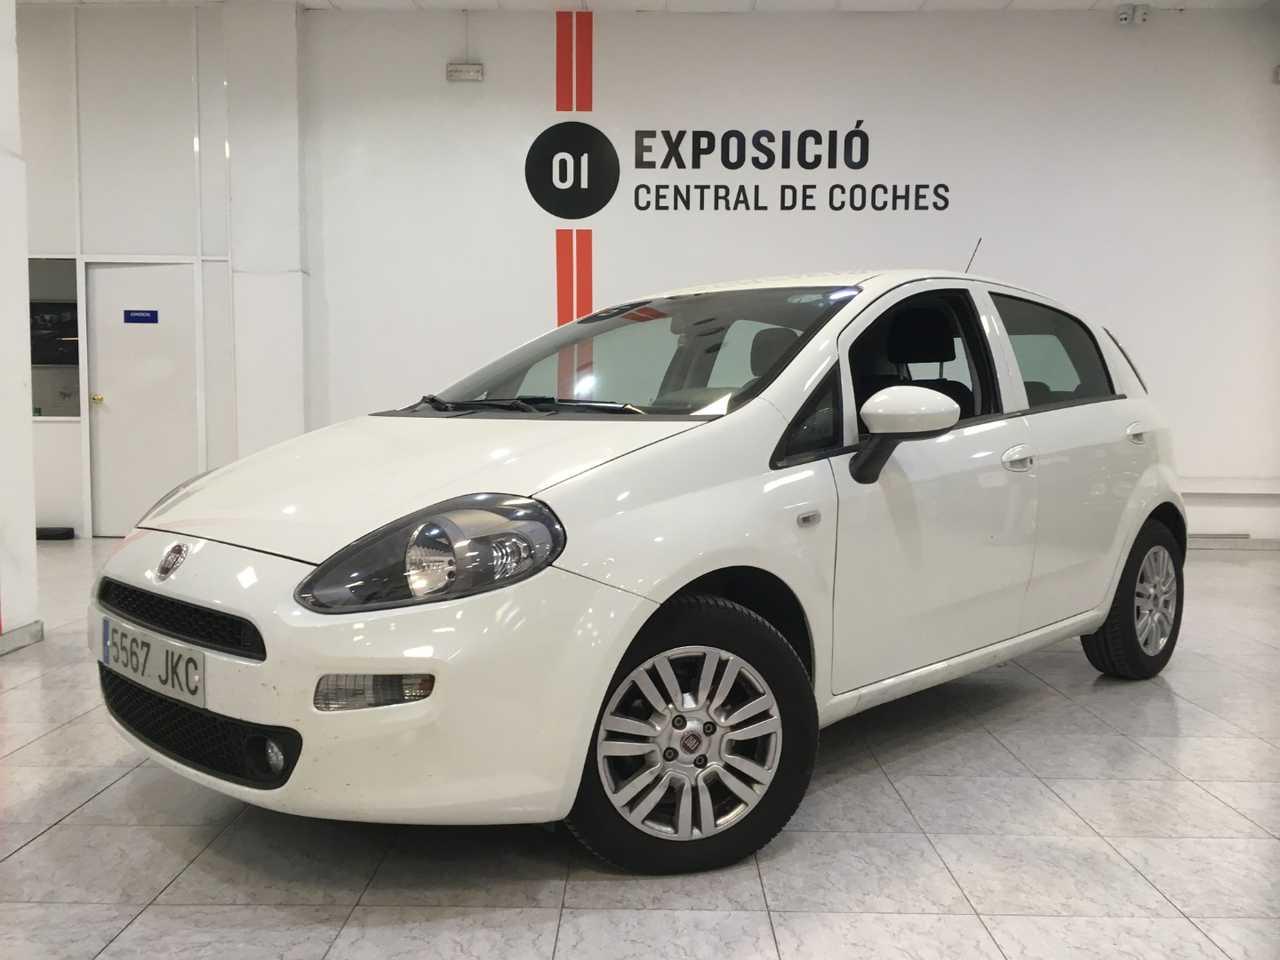 Fiat Punto 1.3 Multijet 75cv 5 Puertas Easy   - Foto 1